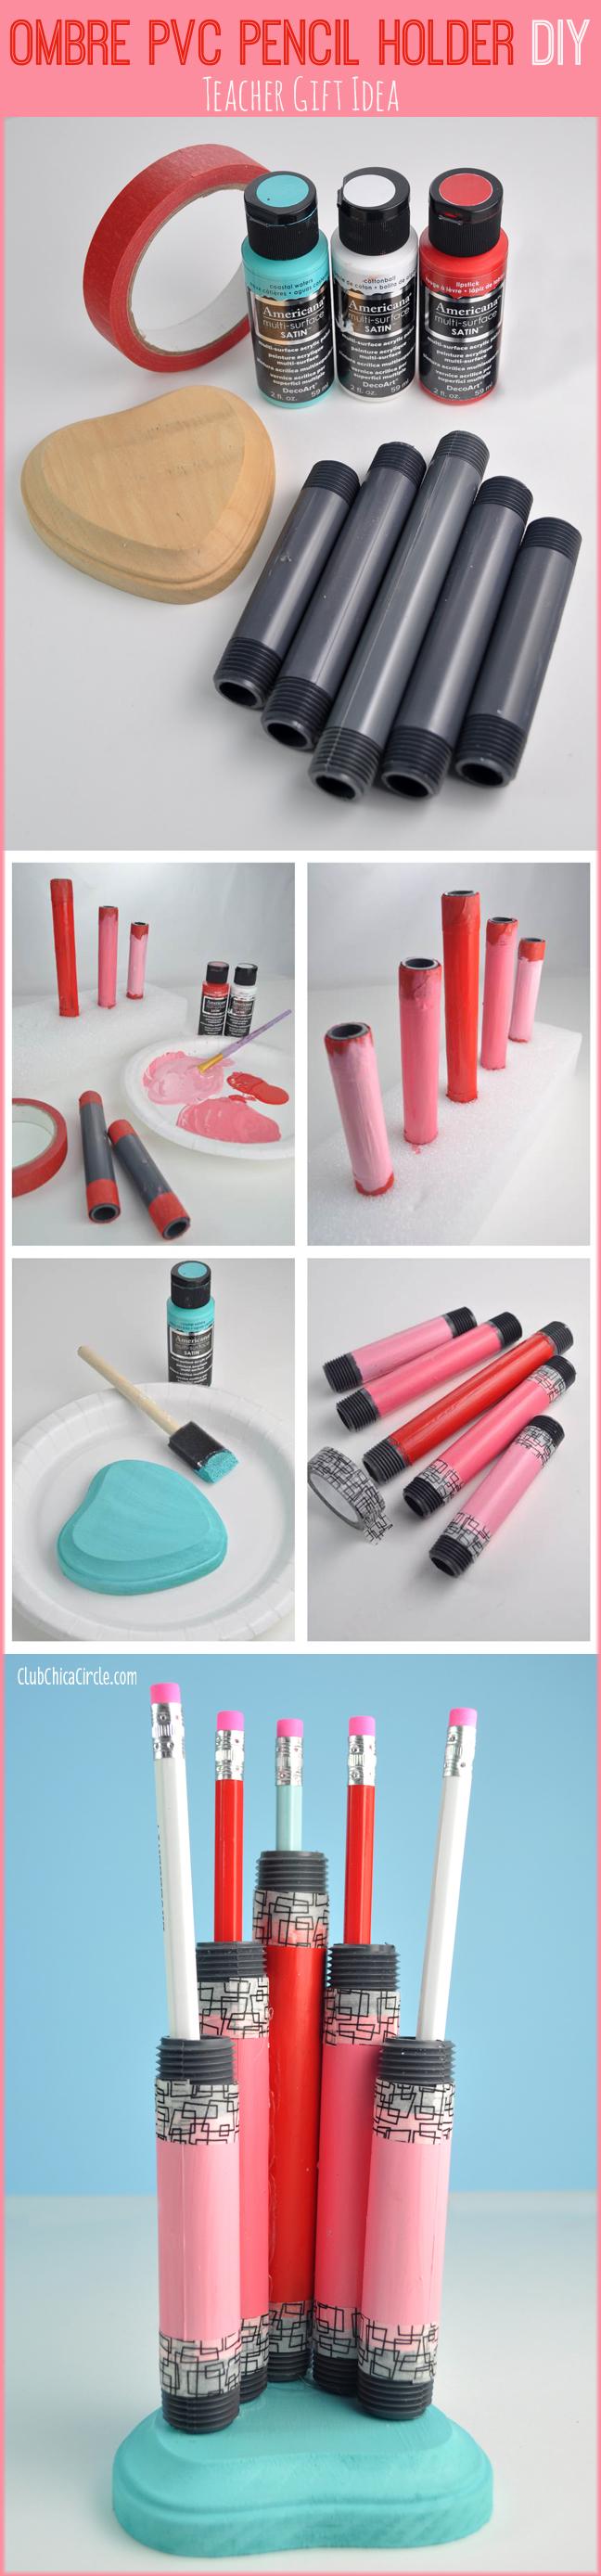 Ombre PVC Pencil Holder DIY craft idea and teacher gift